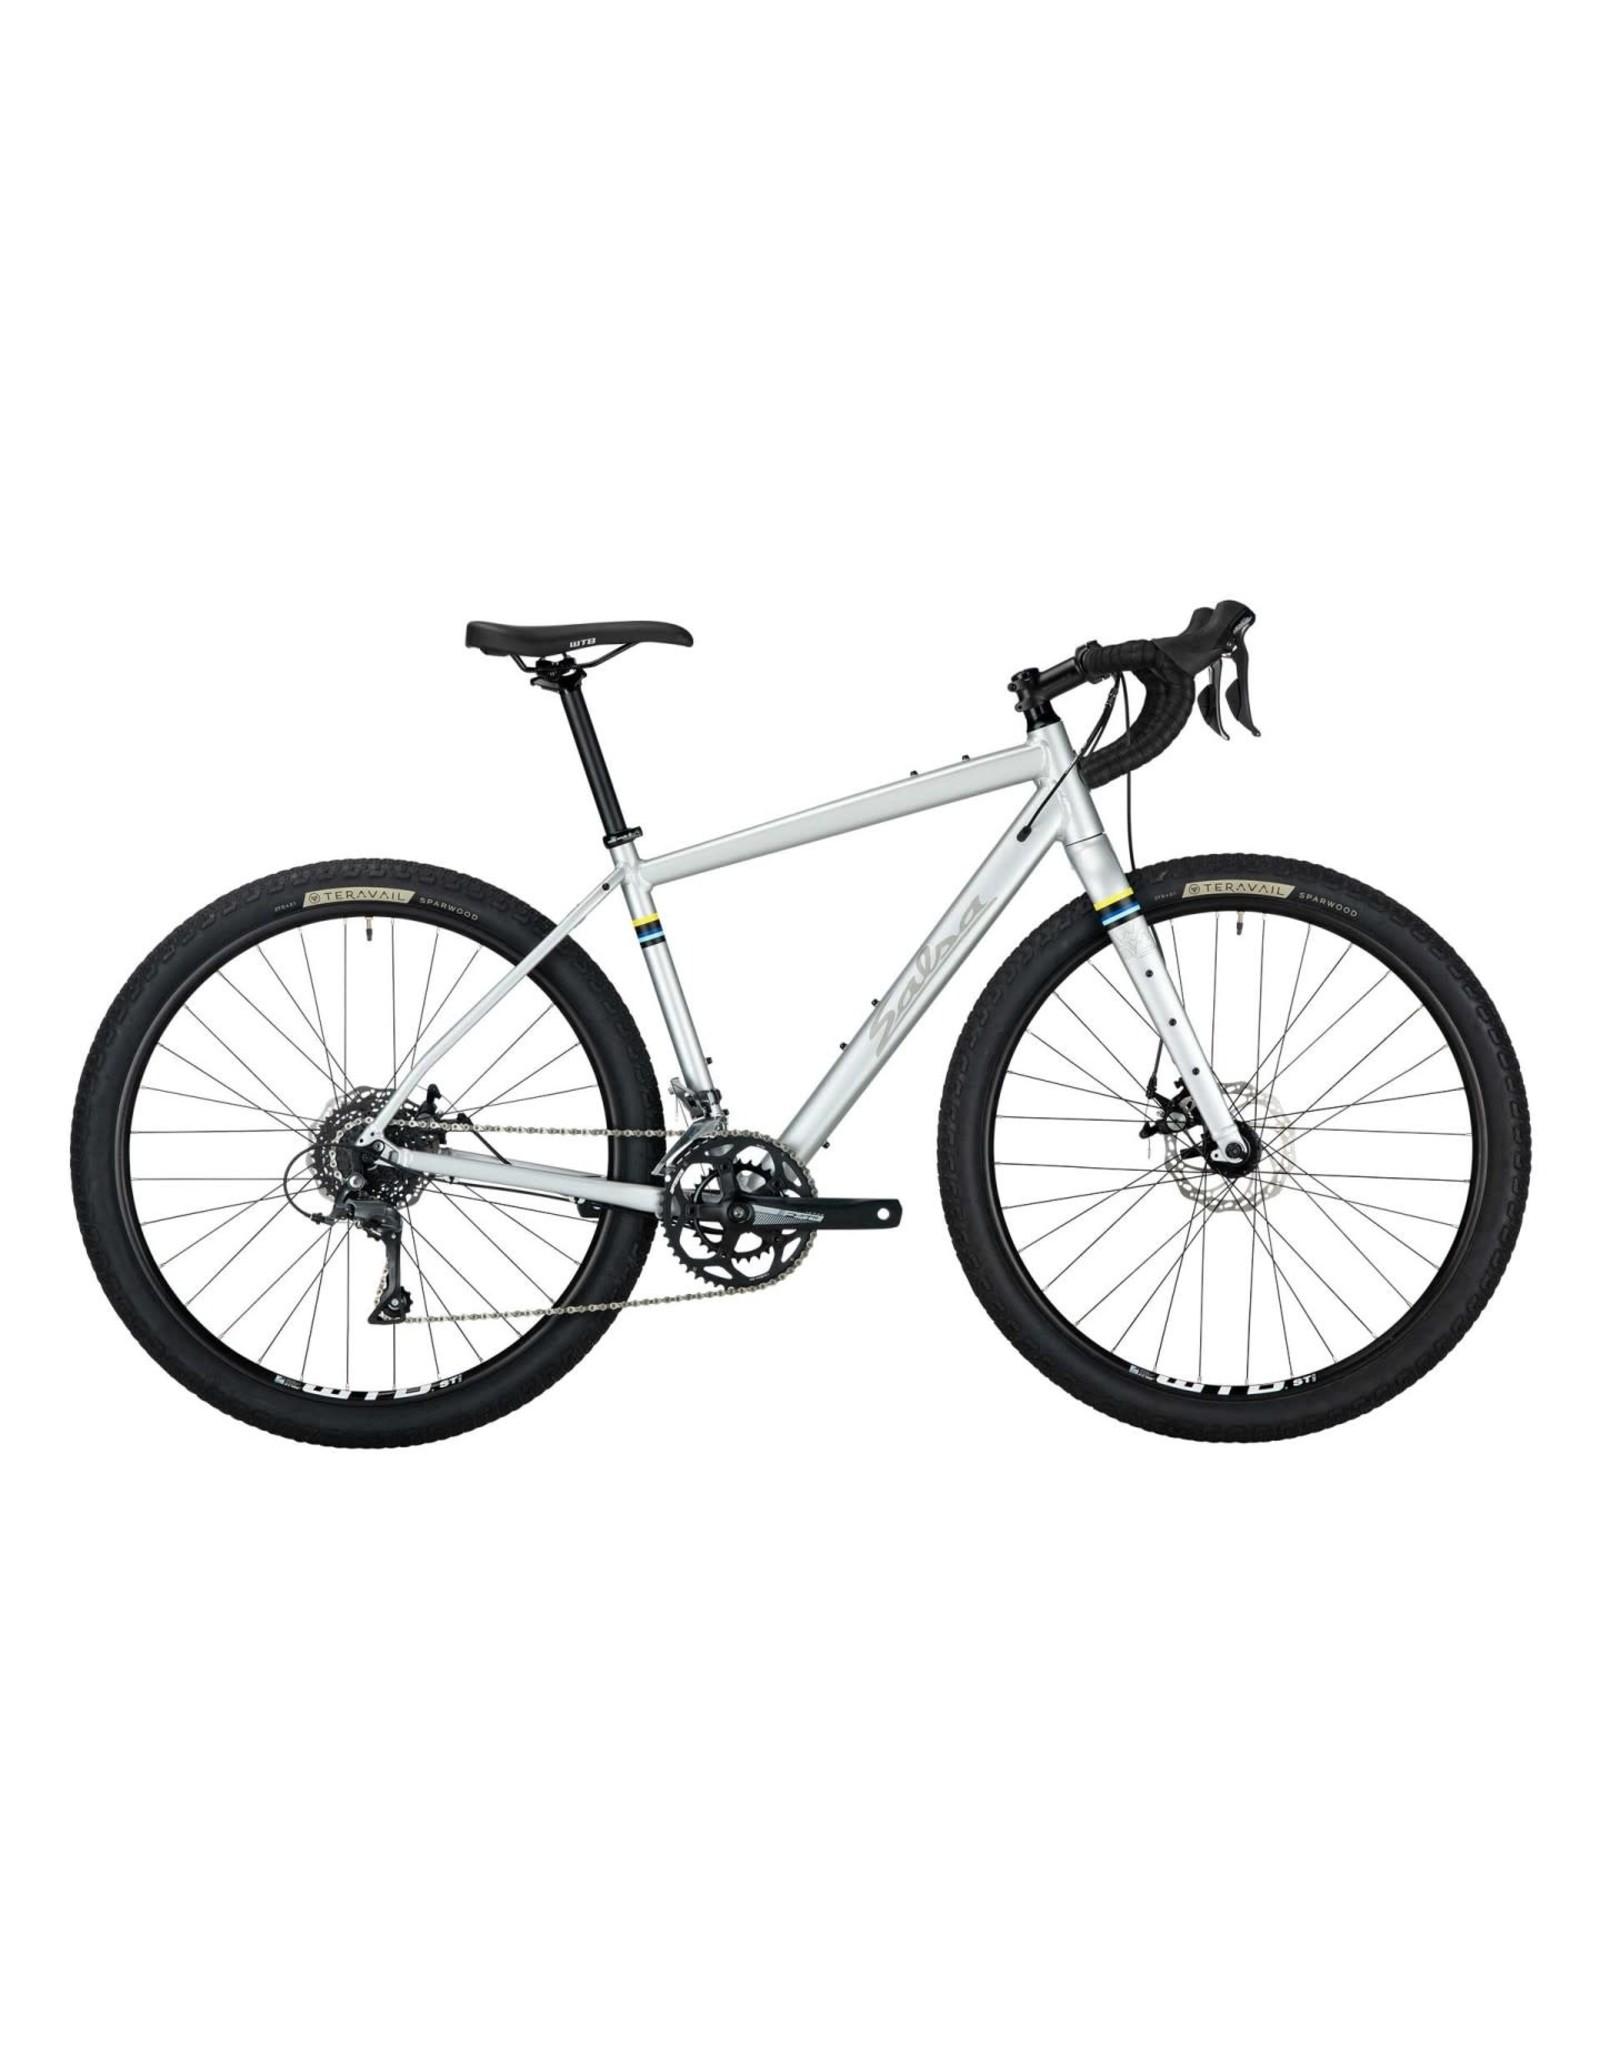 Salsa 2020 Journeyman 650b Claris Bike